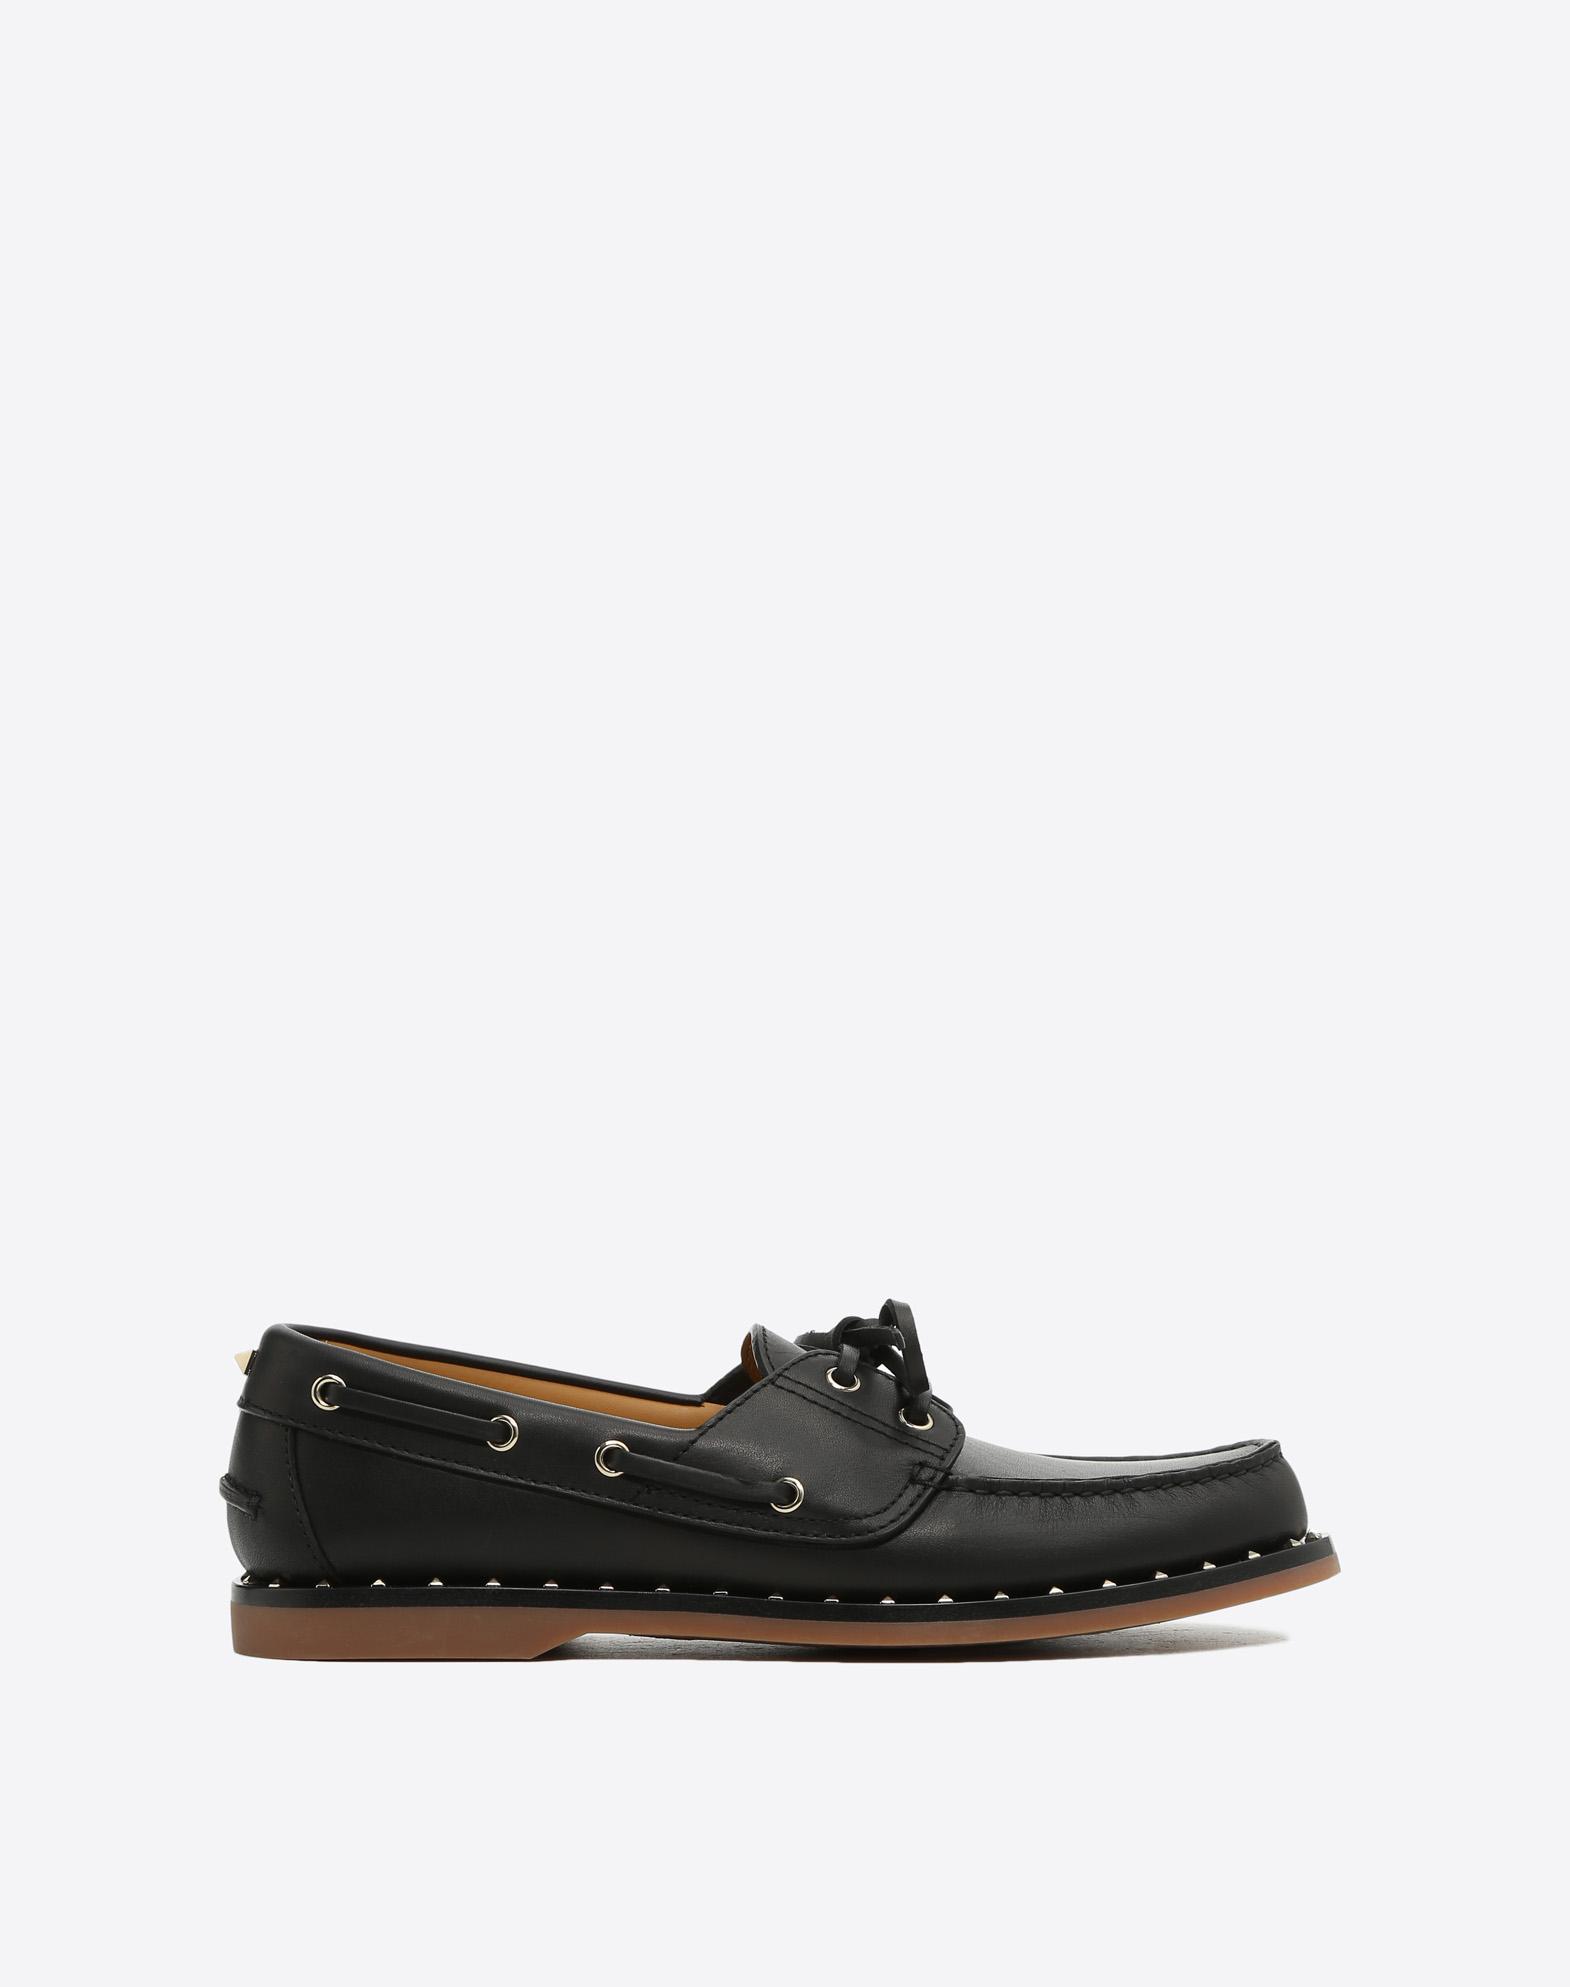 Soul Rockstud Boat shoes